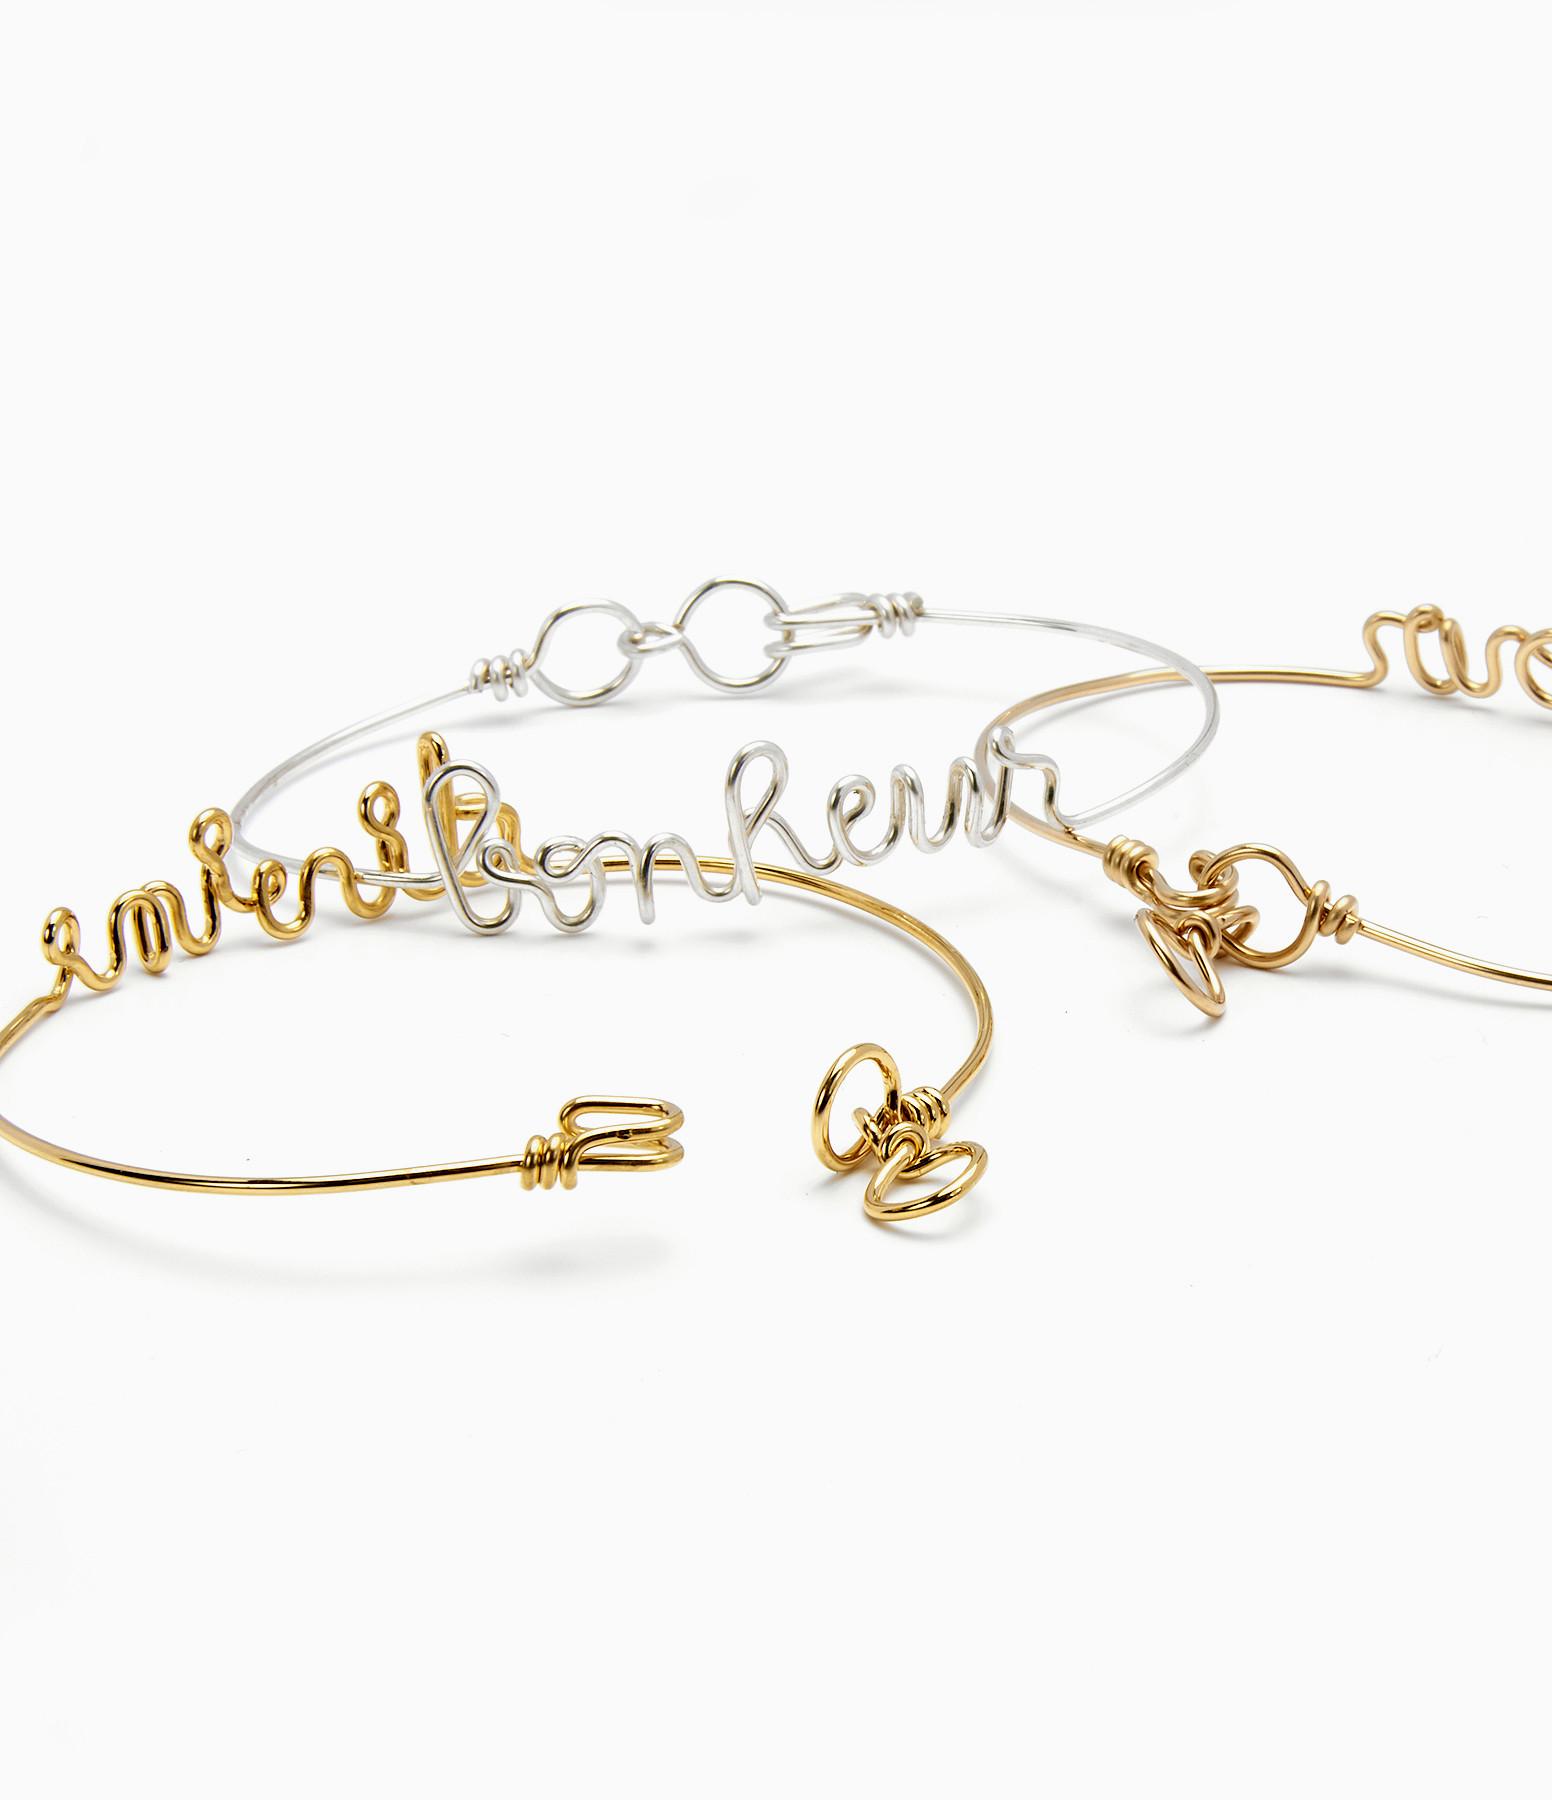 Bracelet Fil Exclu Lulli dream Argent - ATELIER PAULIN